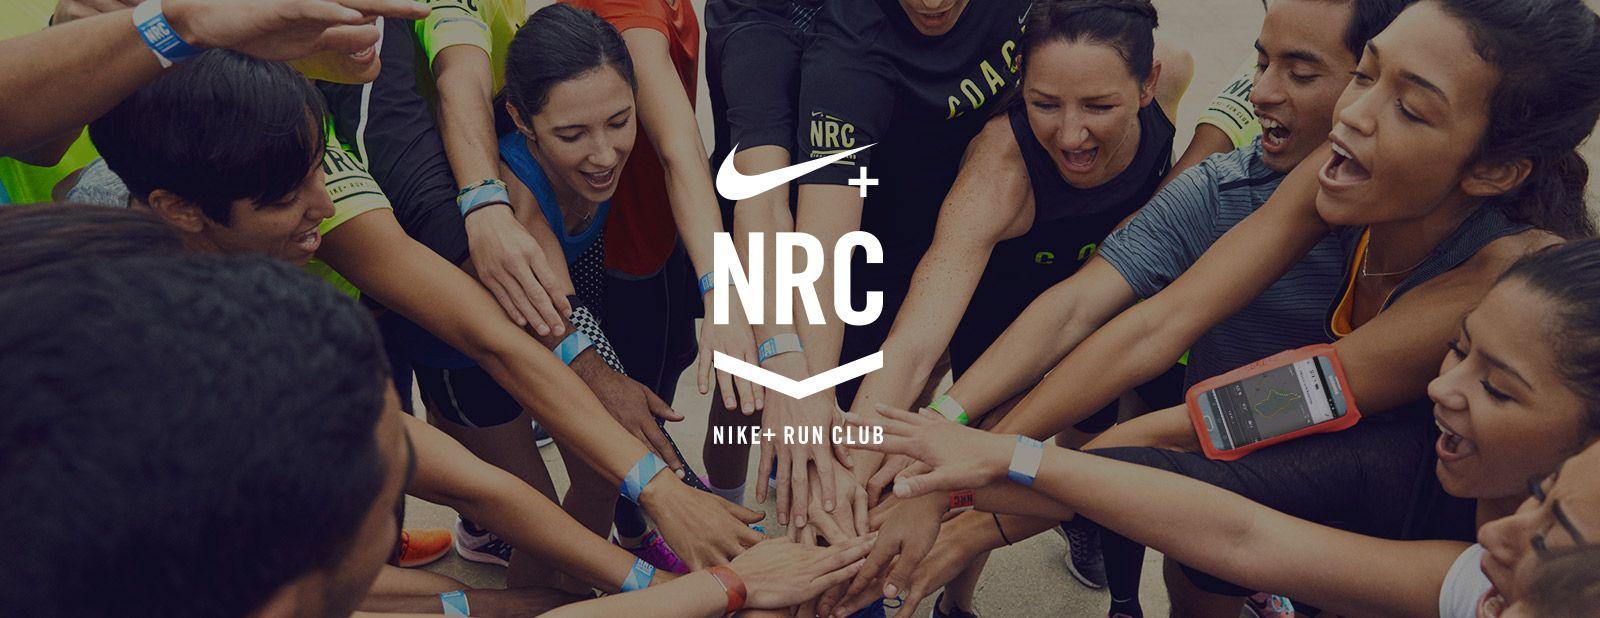 exercicios-para-pernas-nike-training